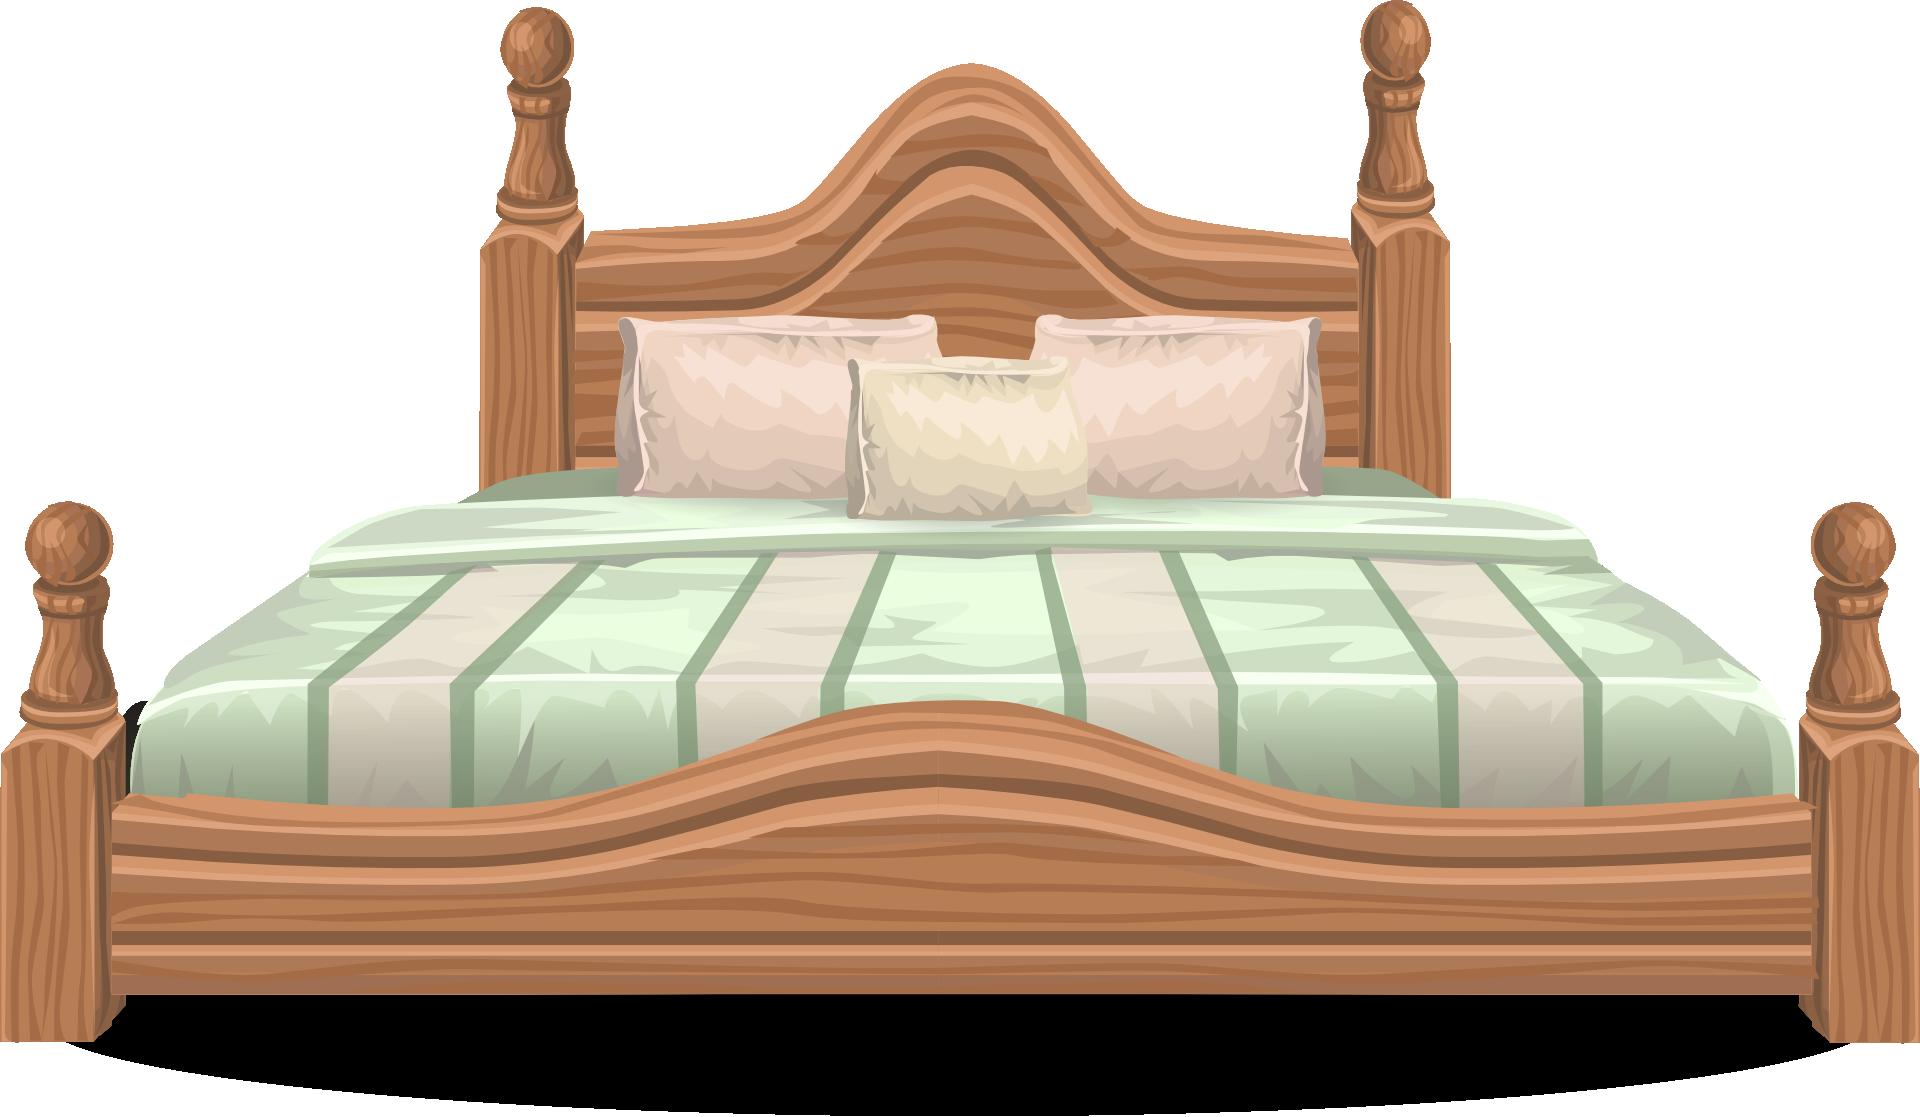 banner freeuse stock Nightstand furniture clip art. Bedroom clipart bedroom set.